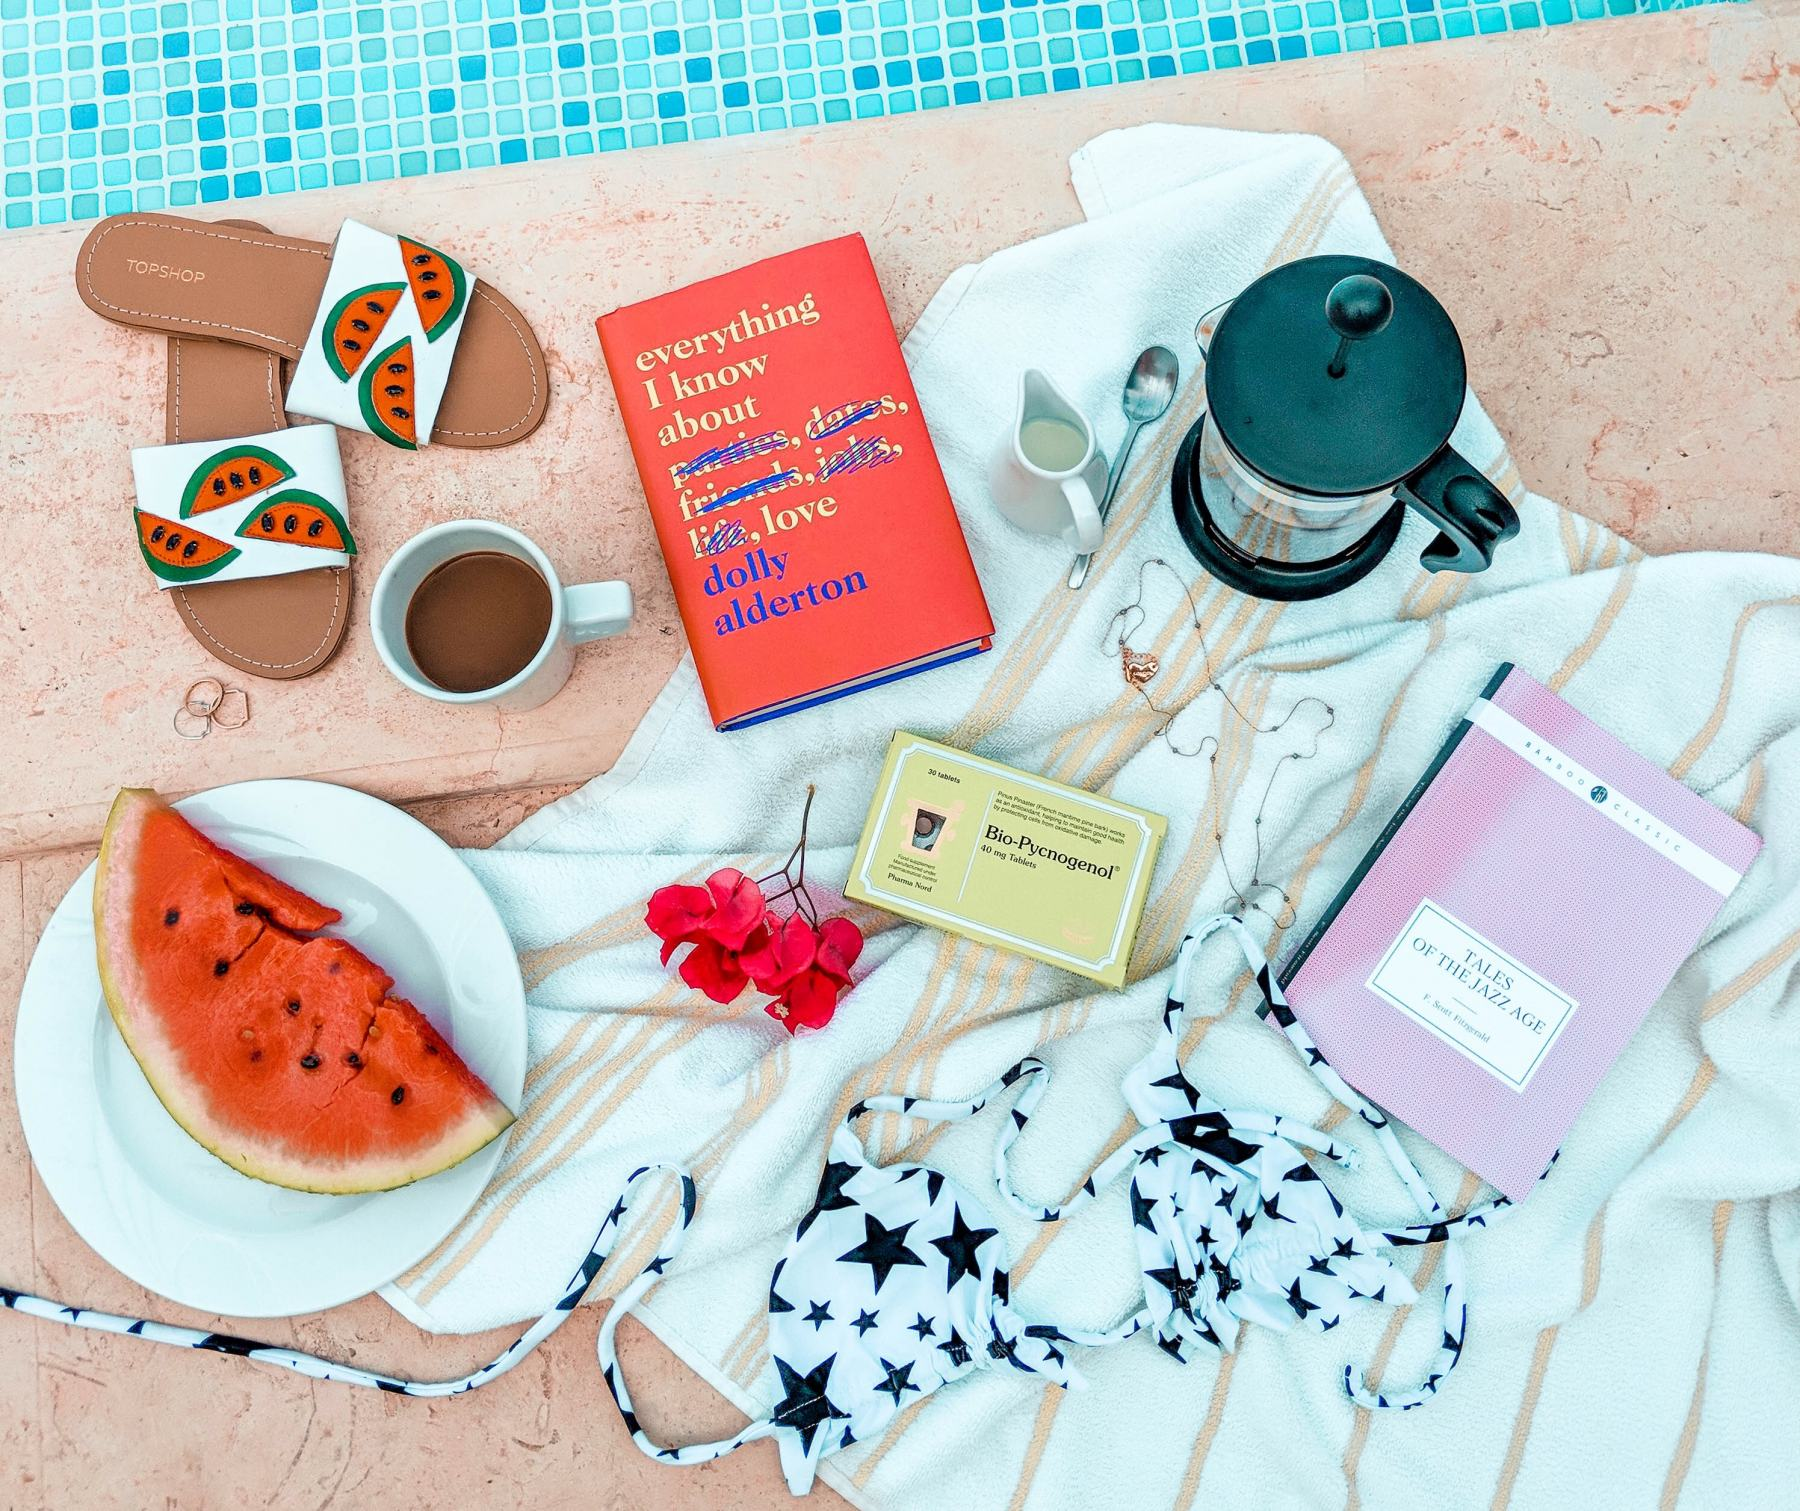 cocoa chelsea jesschamilton travel revolve bikini fruit swimwear health travel dolly book